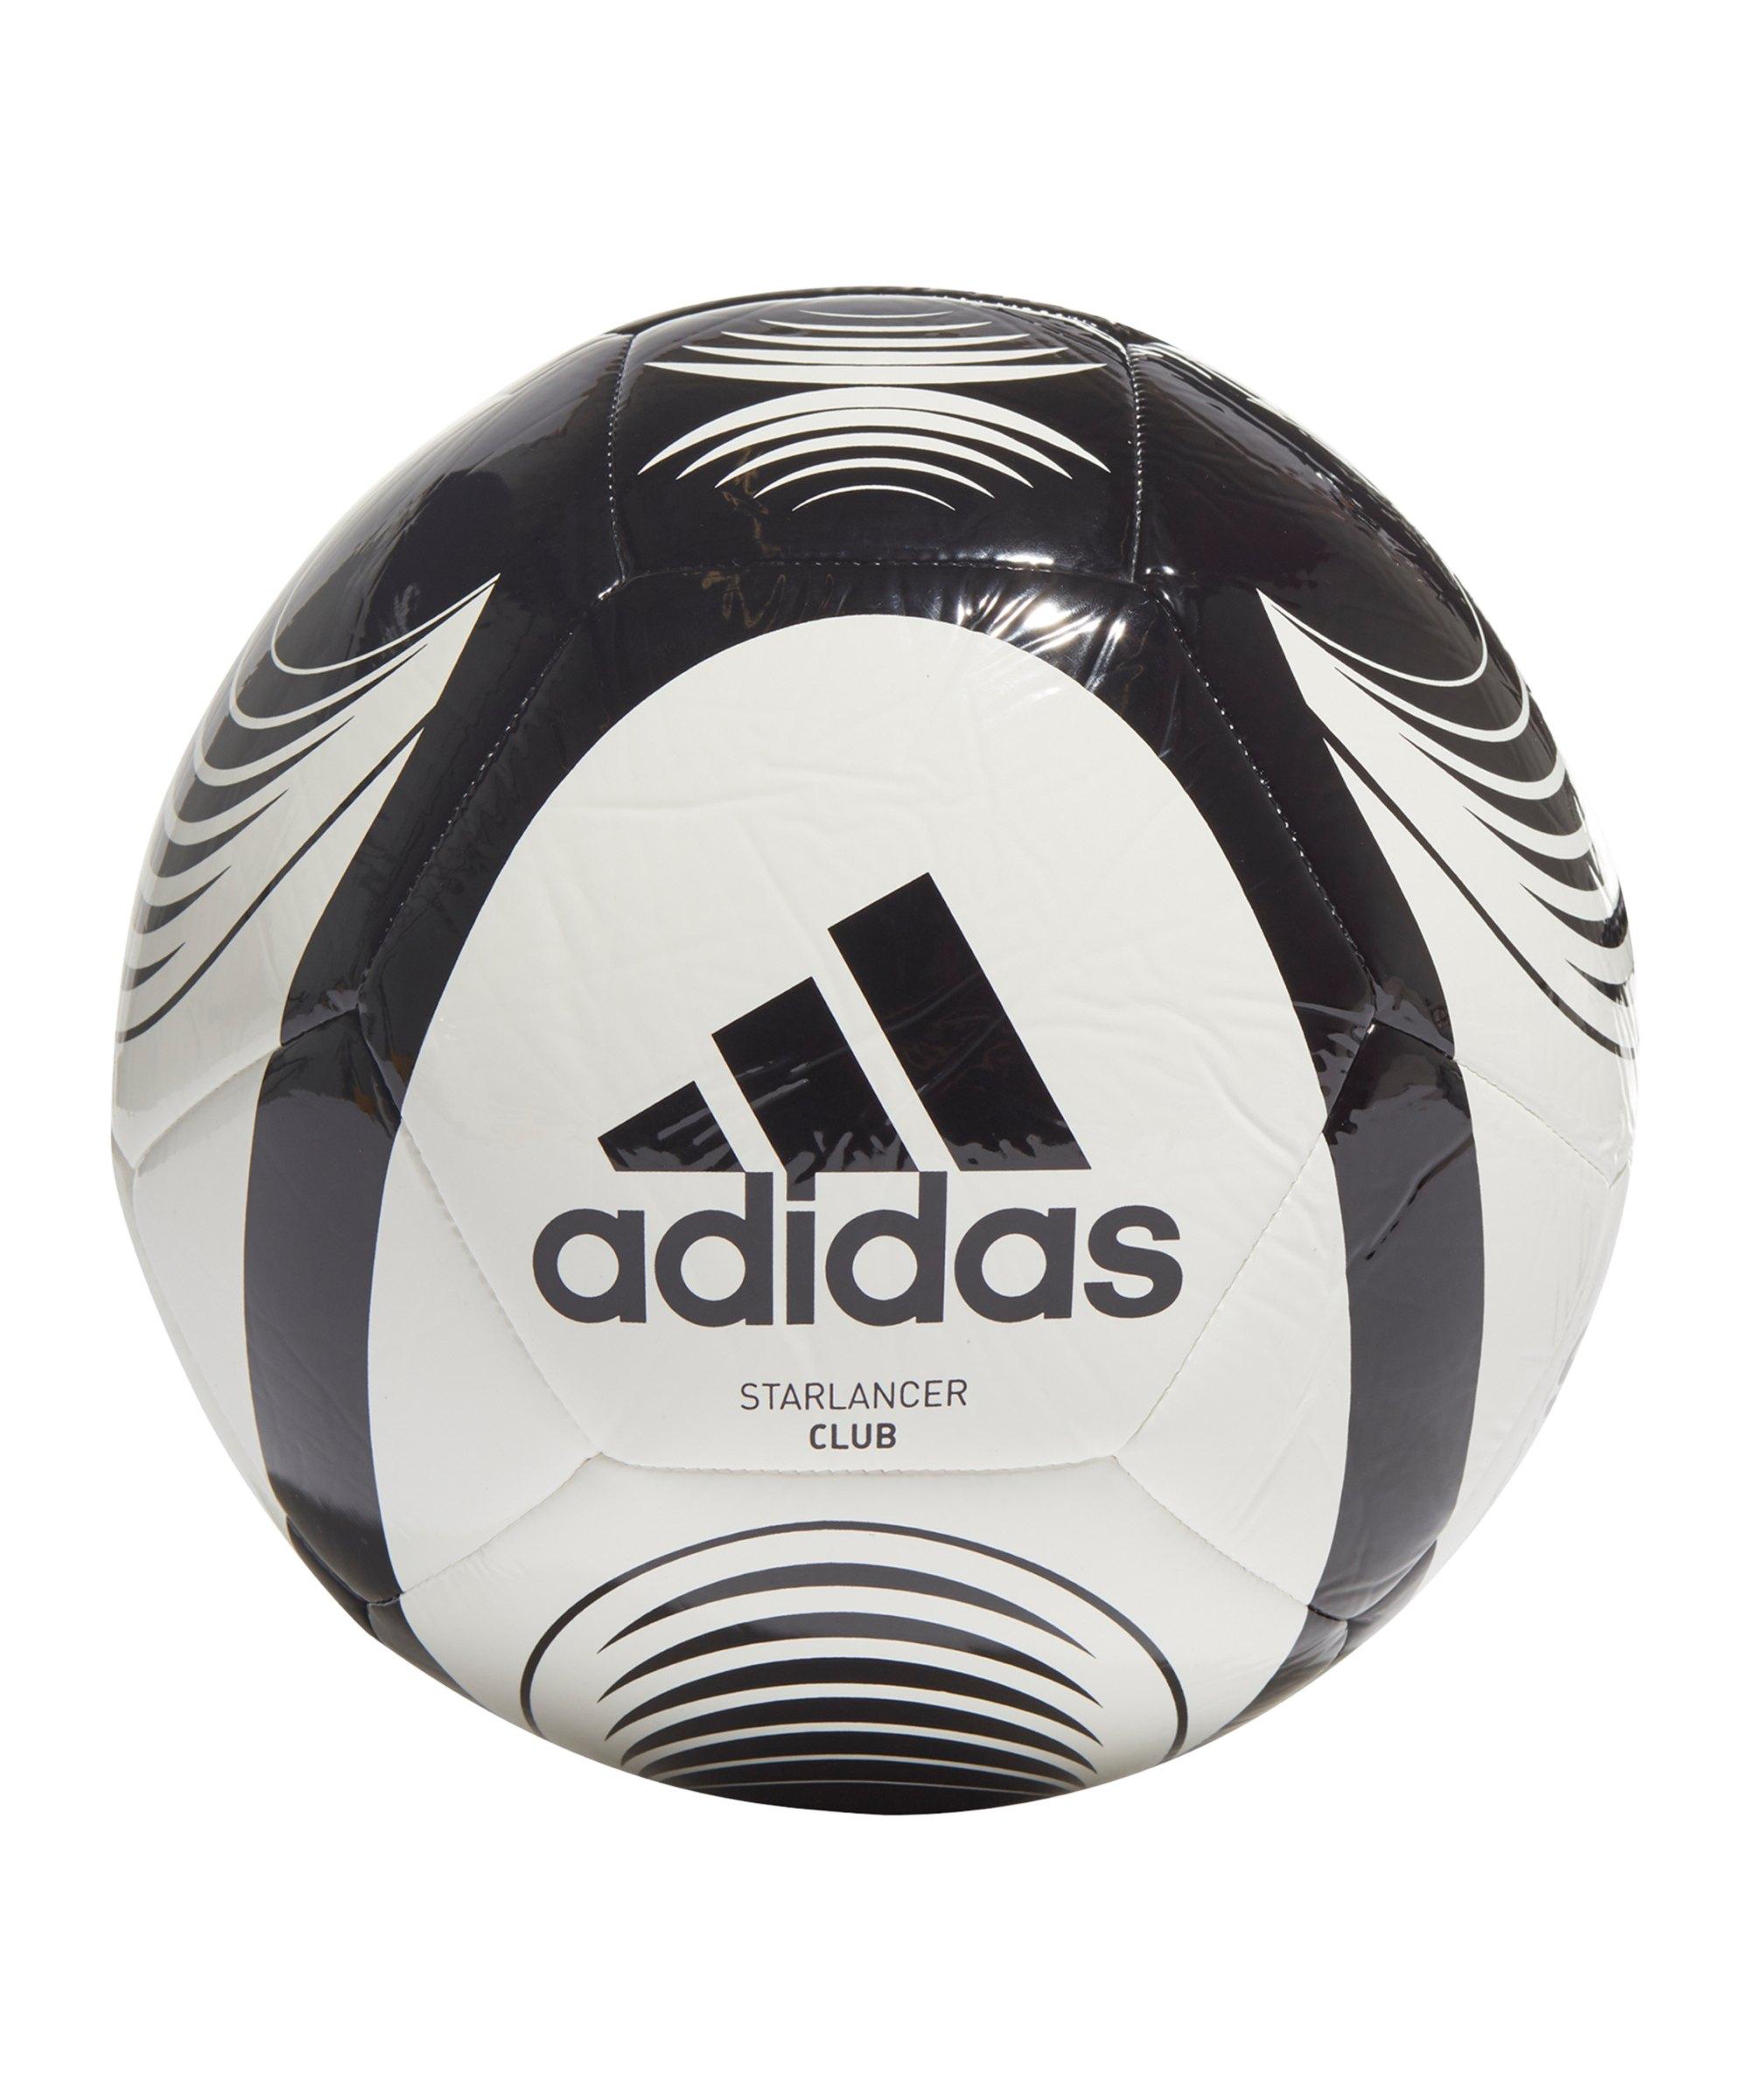 adidas Starlancer Club Fussball Weiss Schwarz - weiss